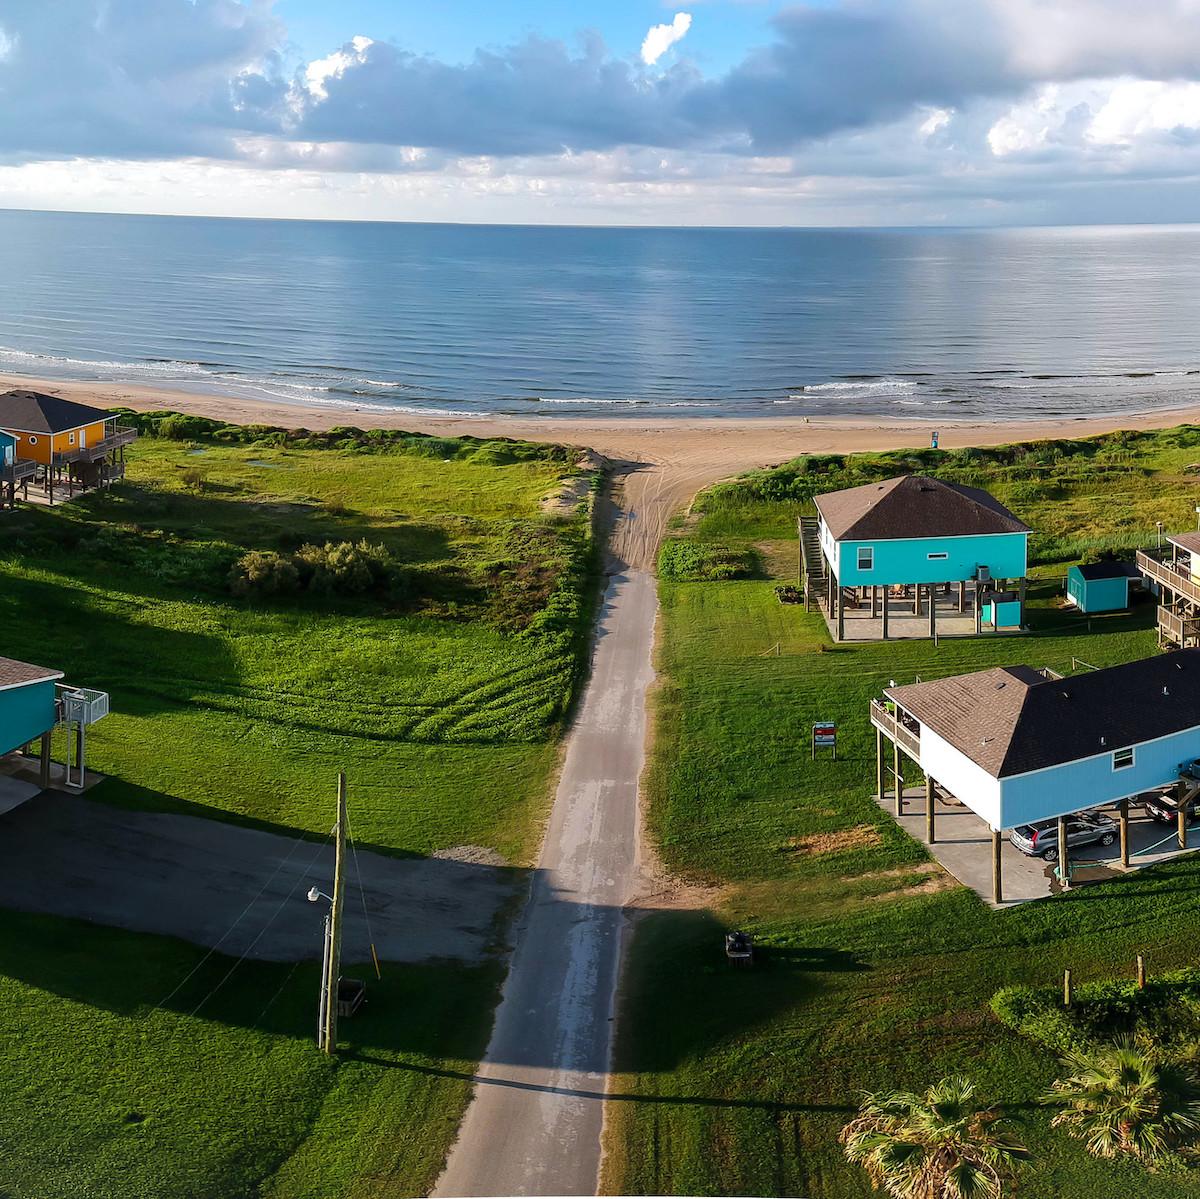 Beach houses in the Bolivar Peninsula.